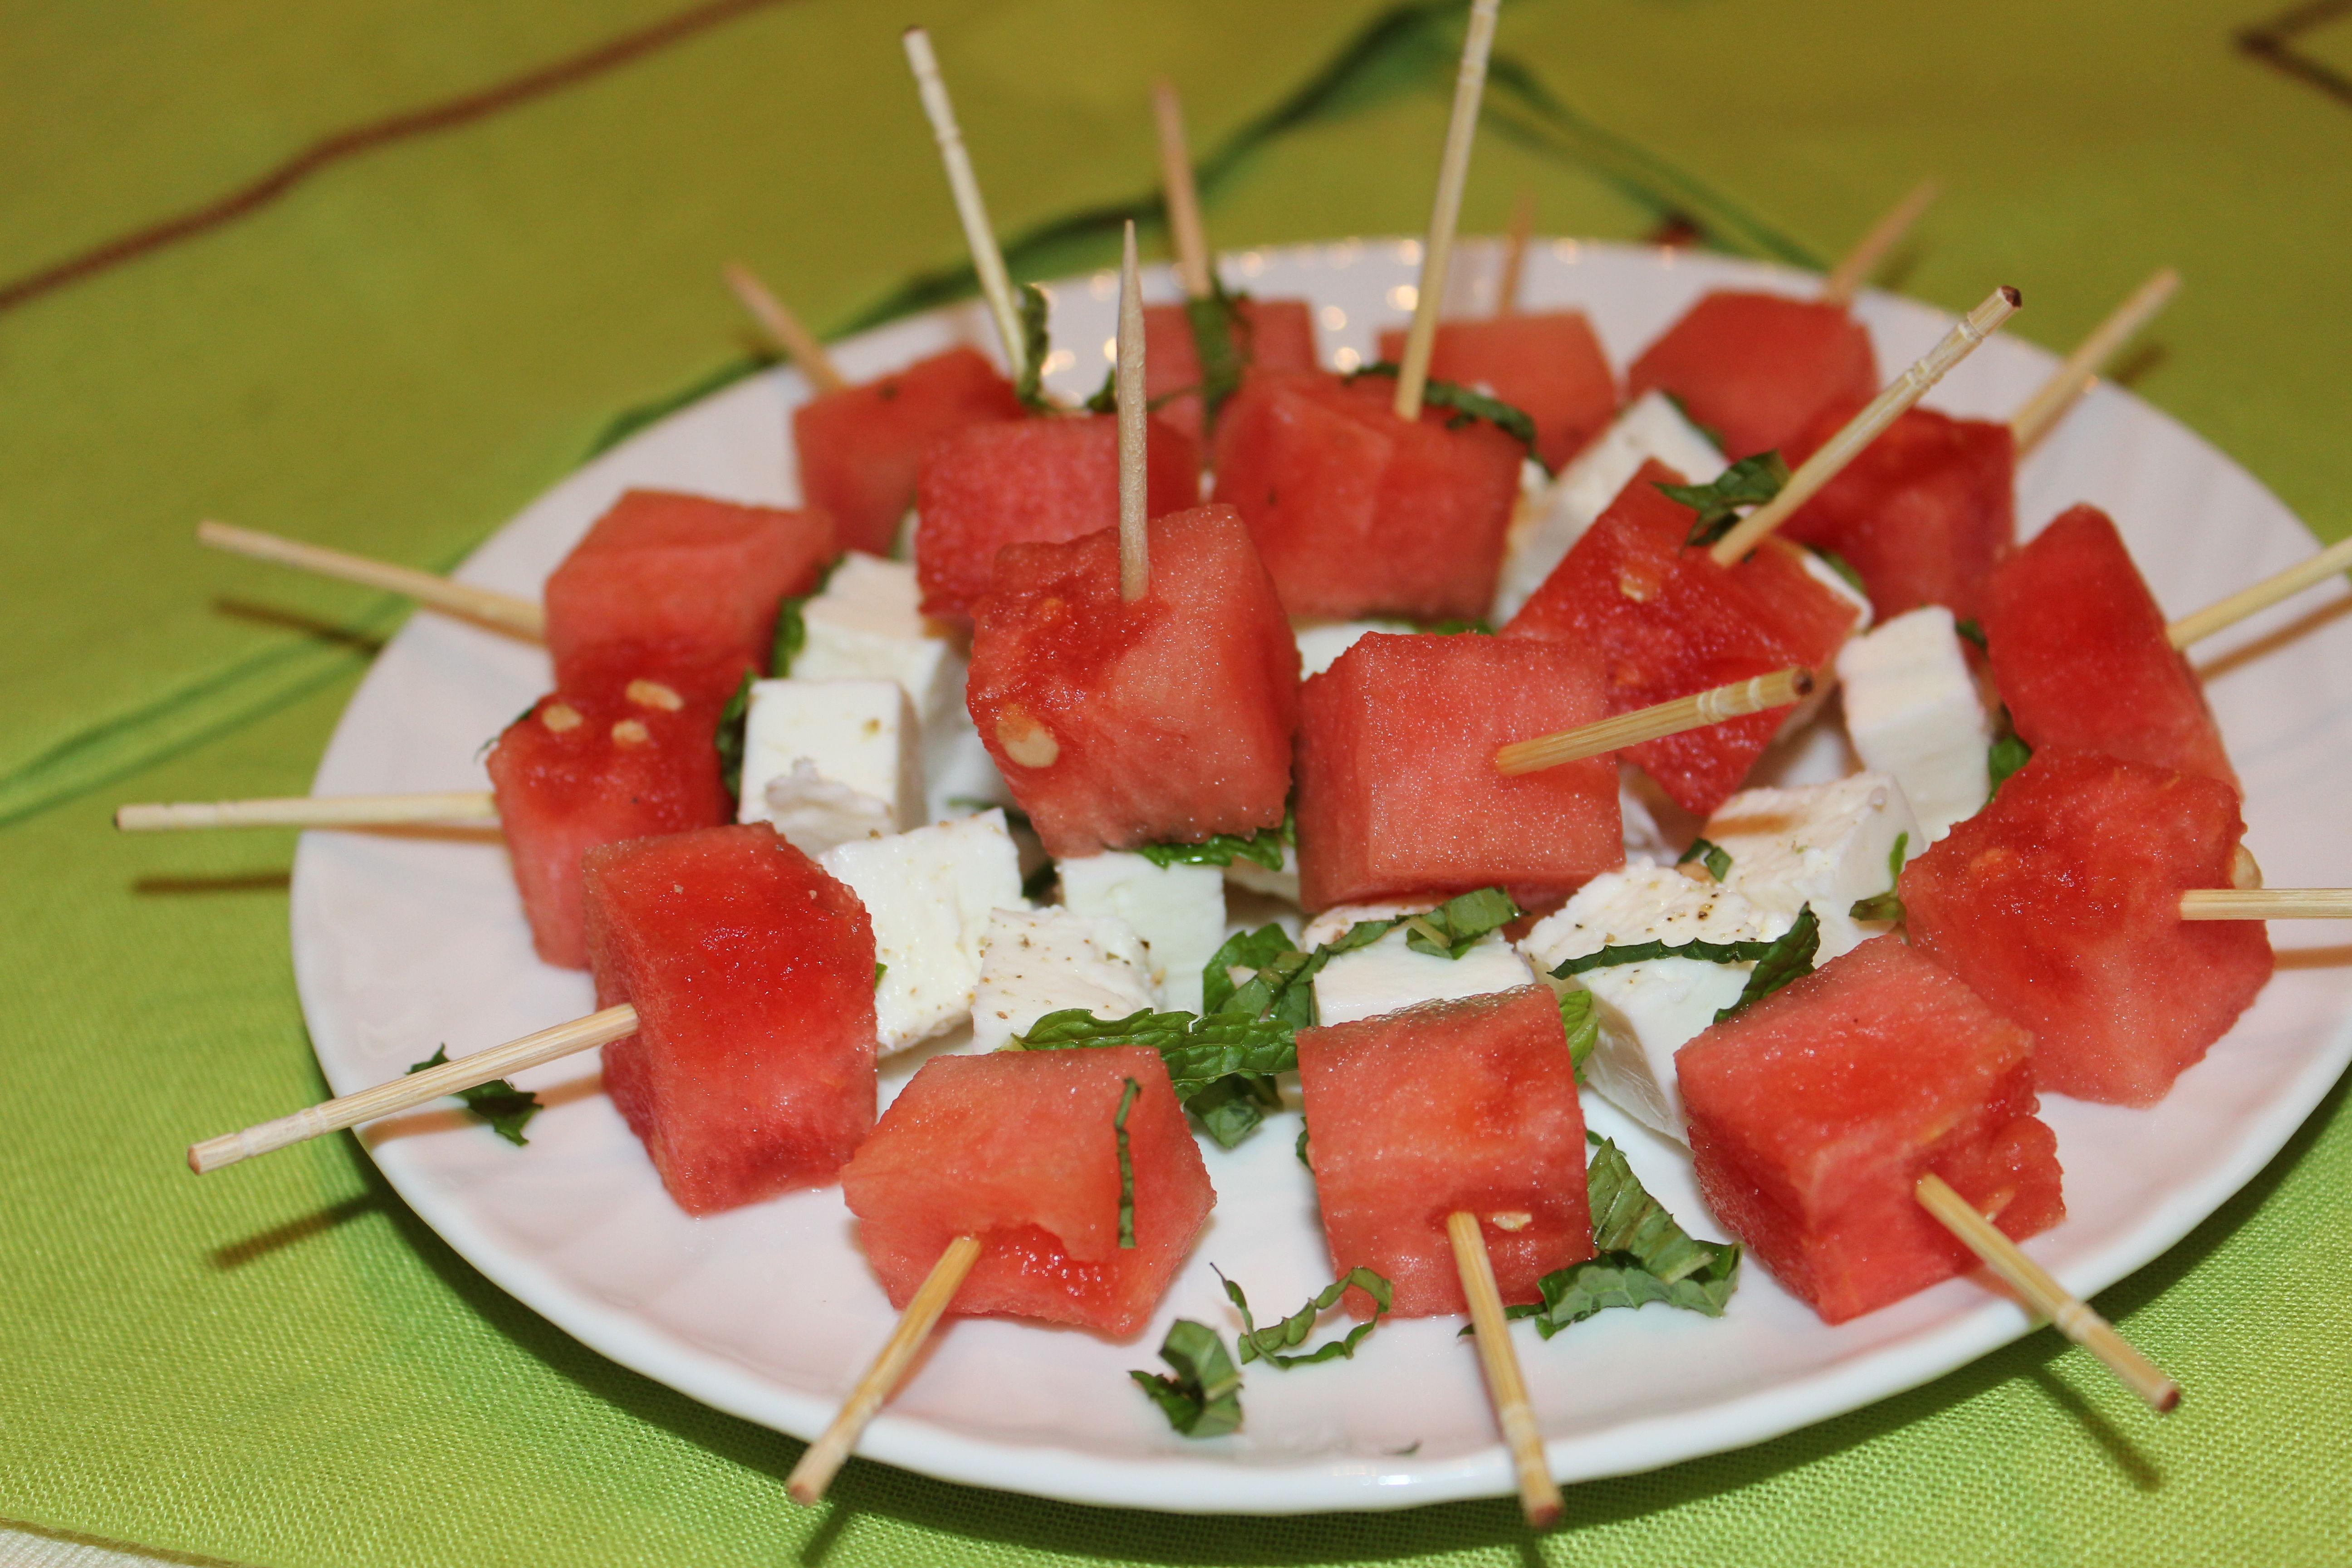 Watermelon-Feta Skewers